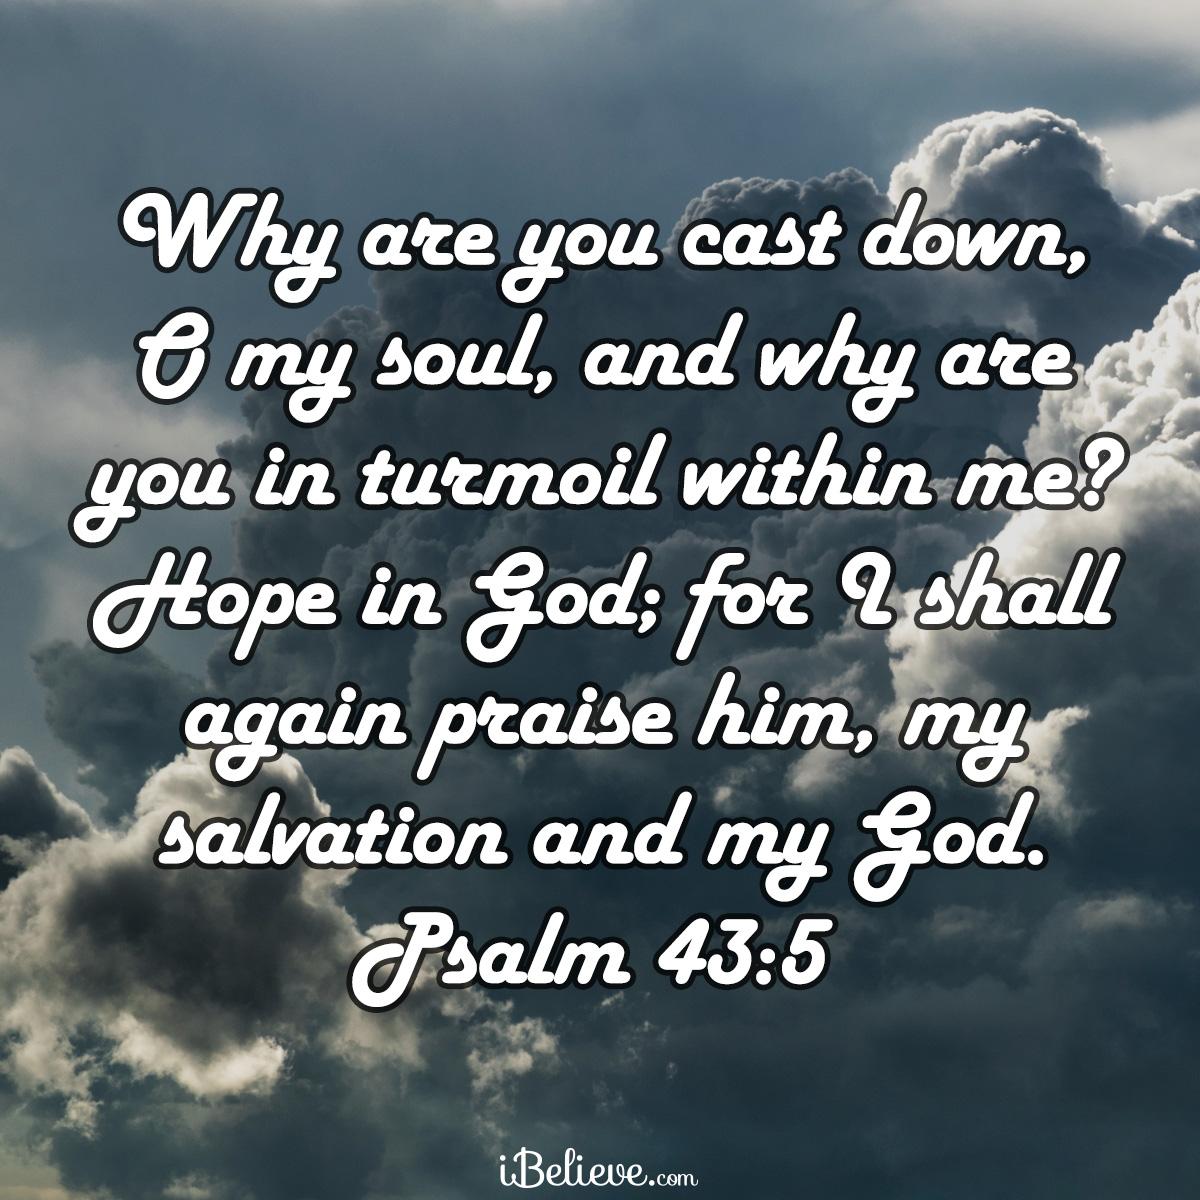 Psalm 43:5, inspirational image